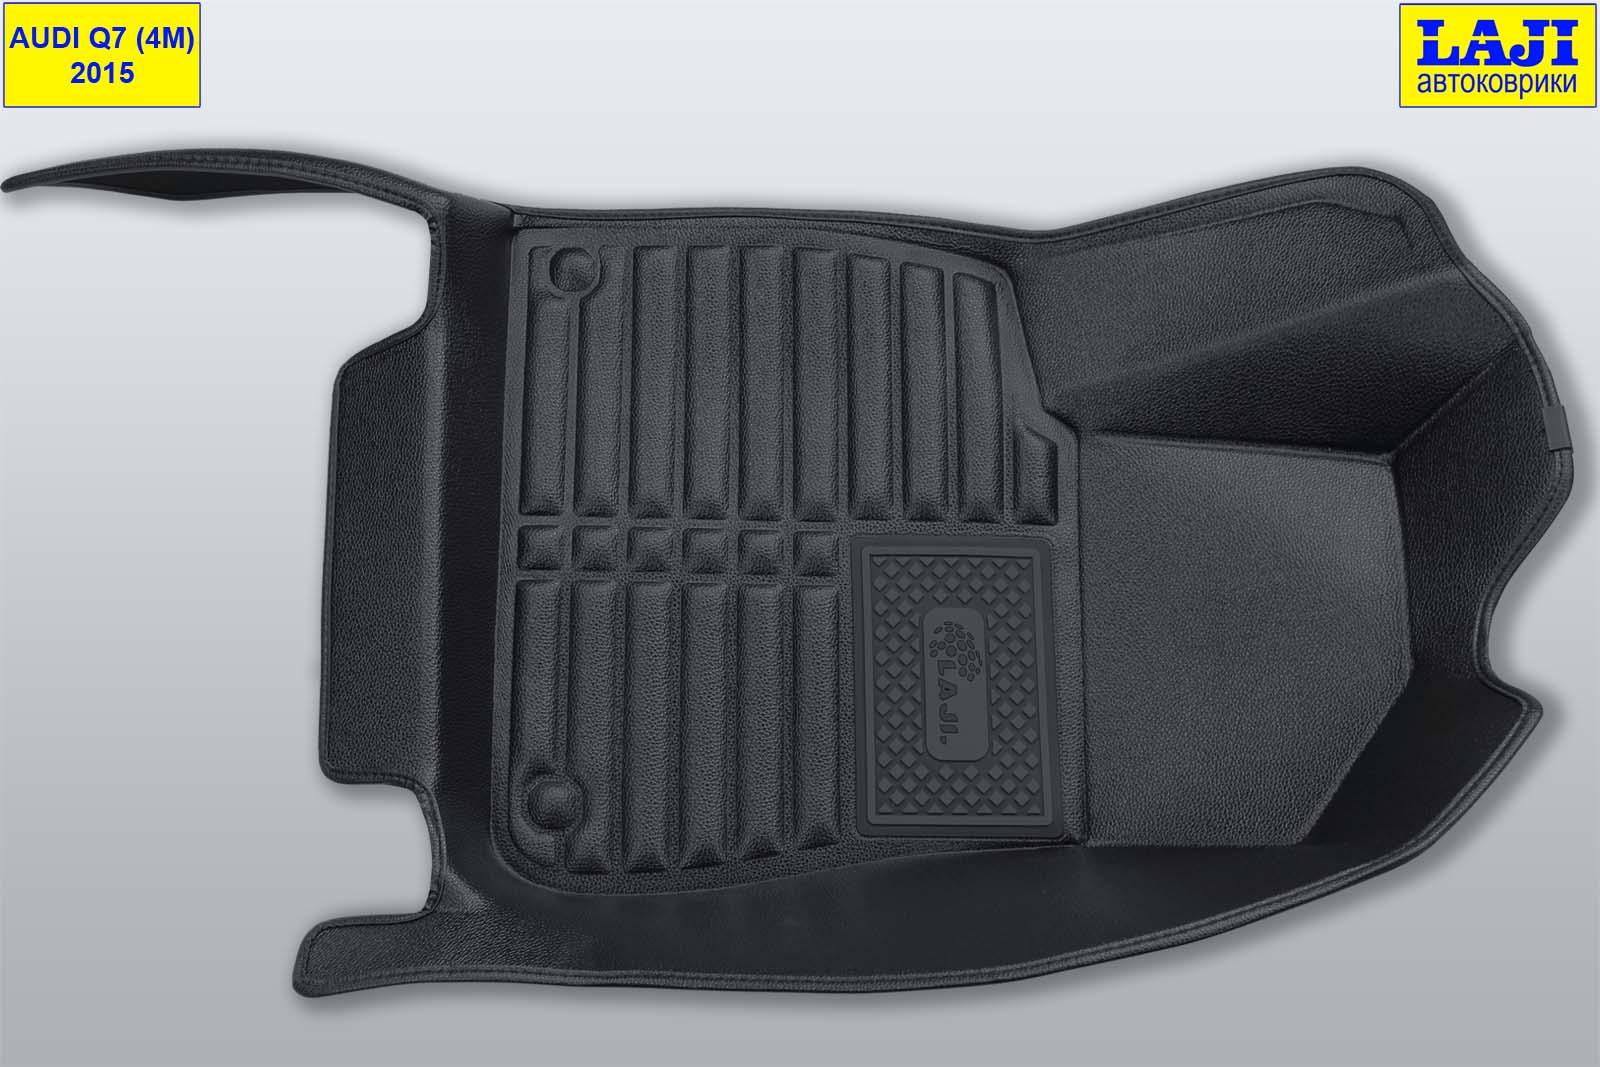 5D коврики для Audi Q7 4M 2015-н.в. 2